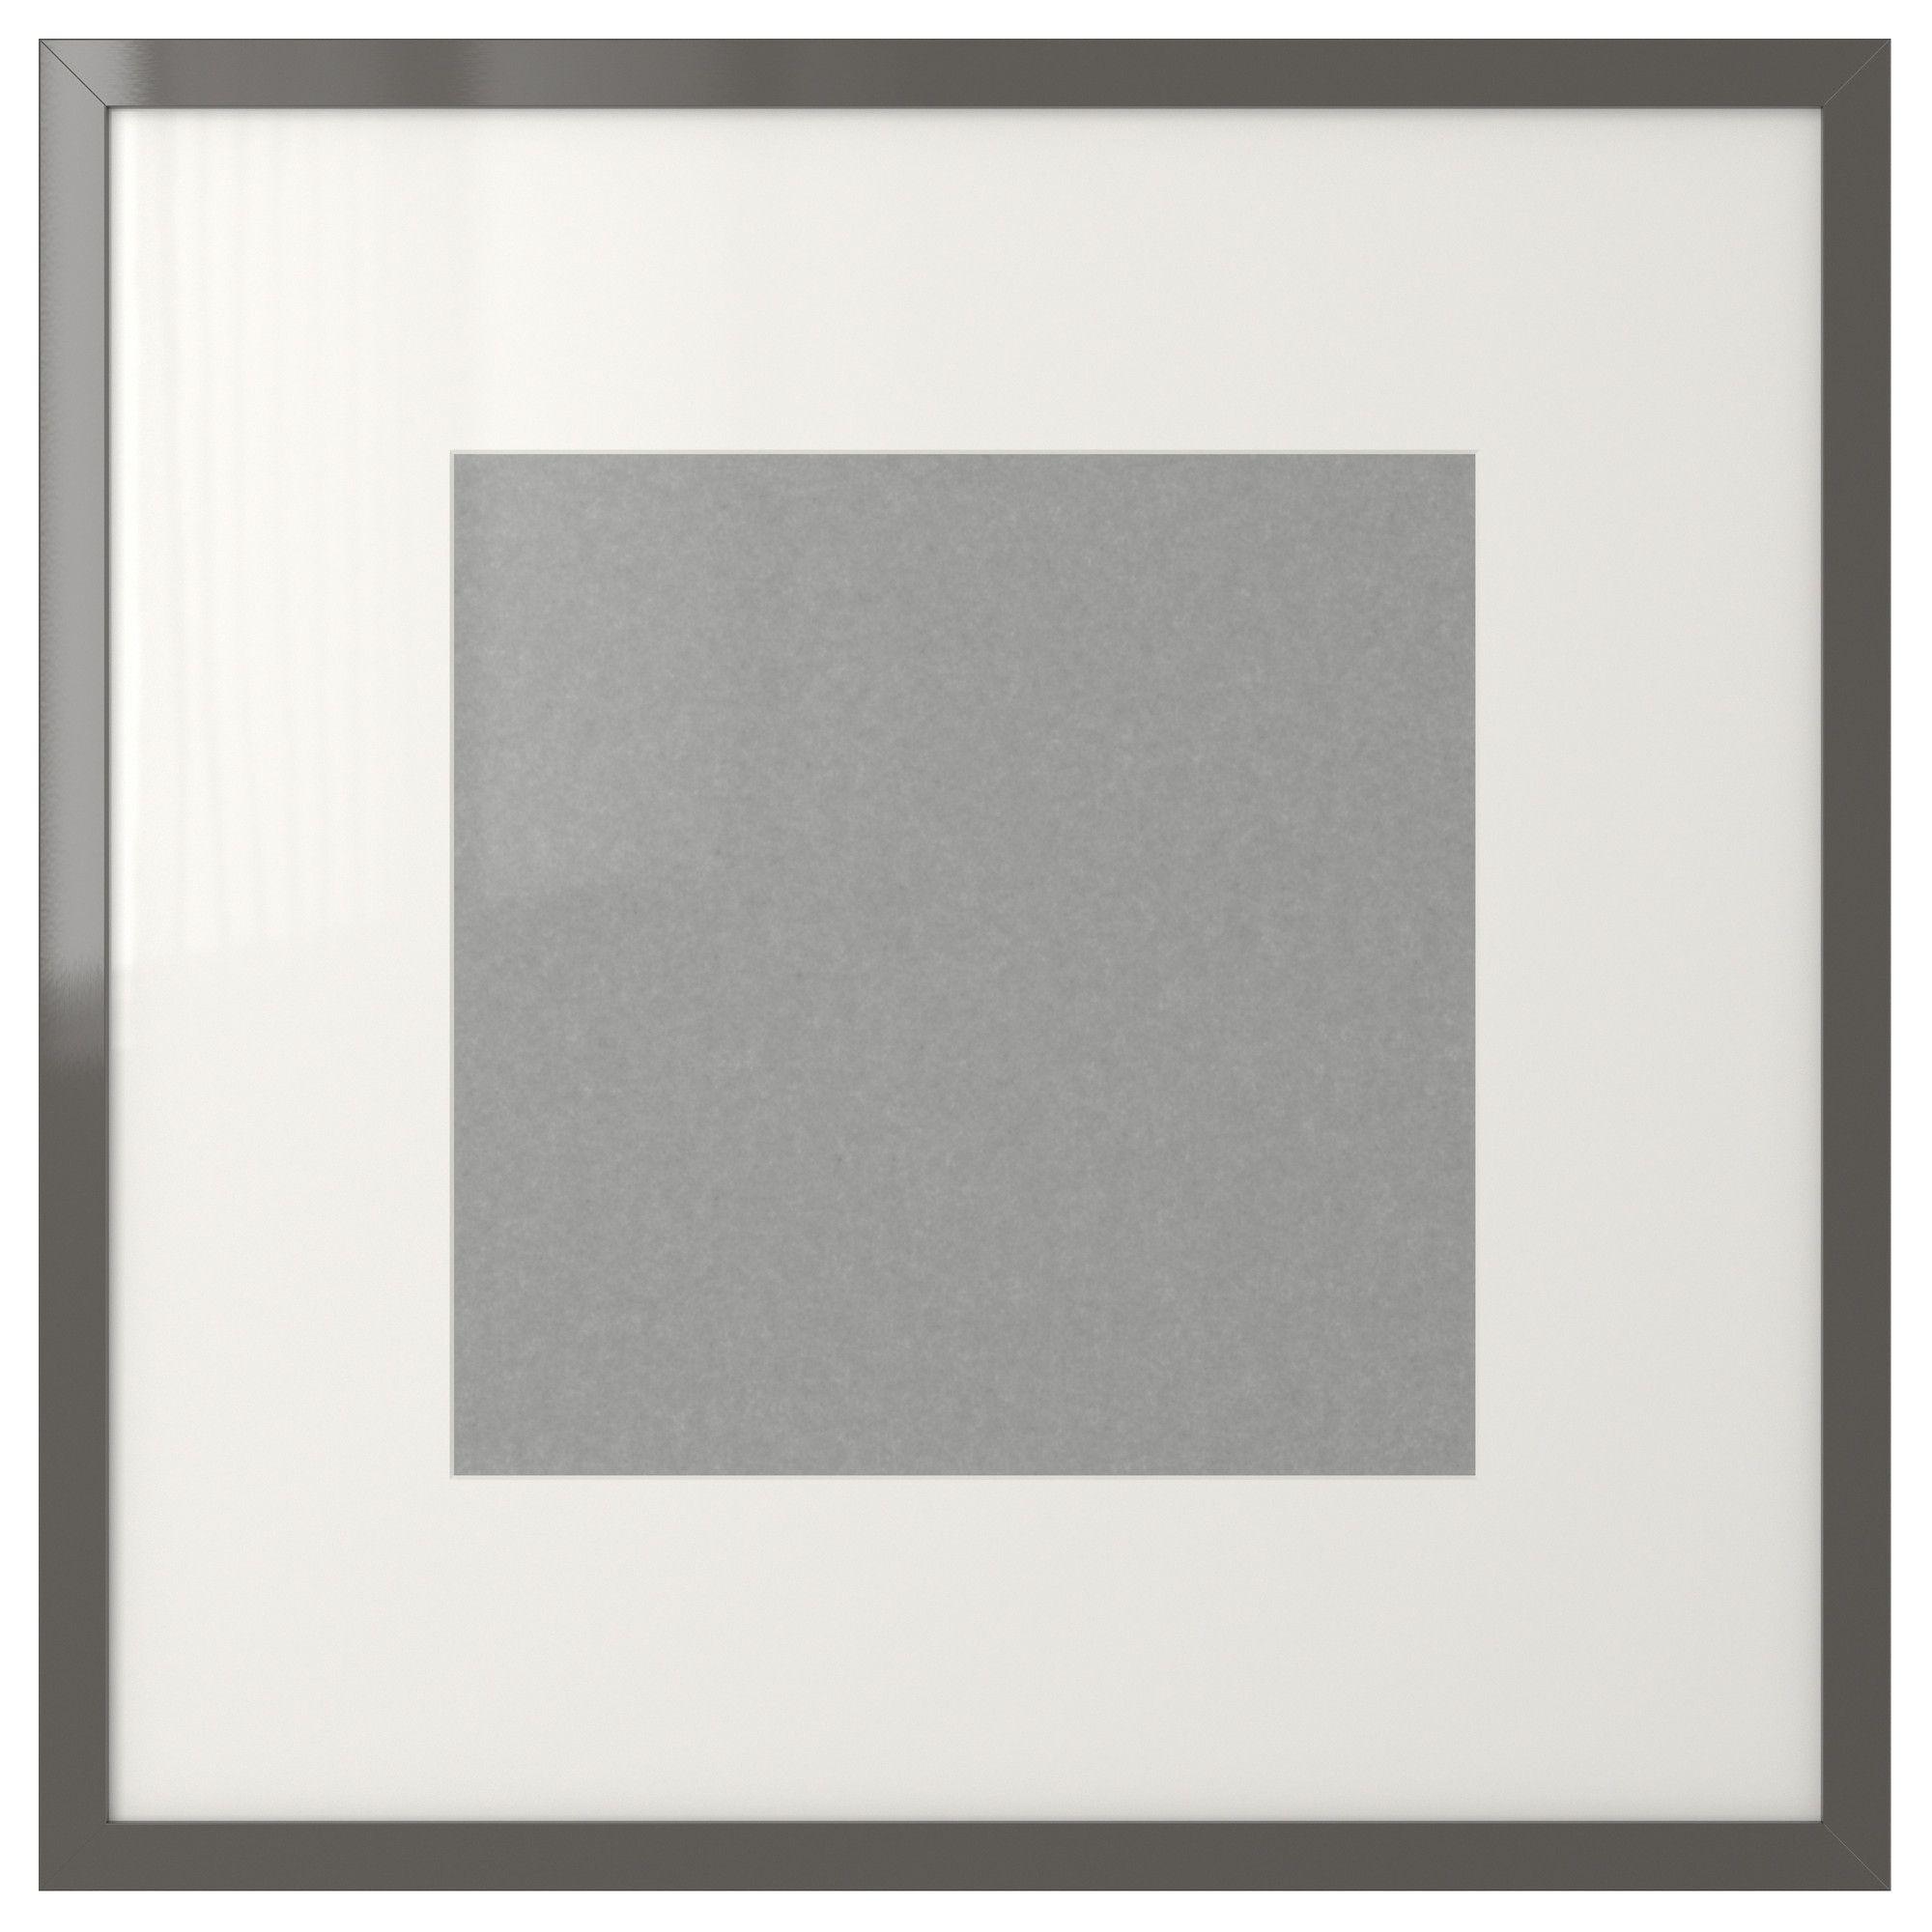 Ribba frame high gloss gray ikea adrien nursery for Ikea ribba